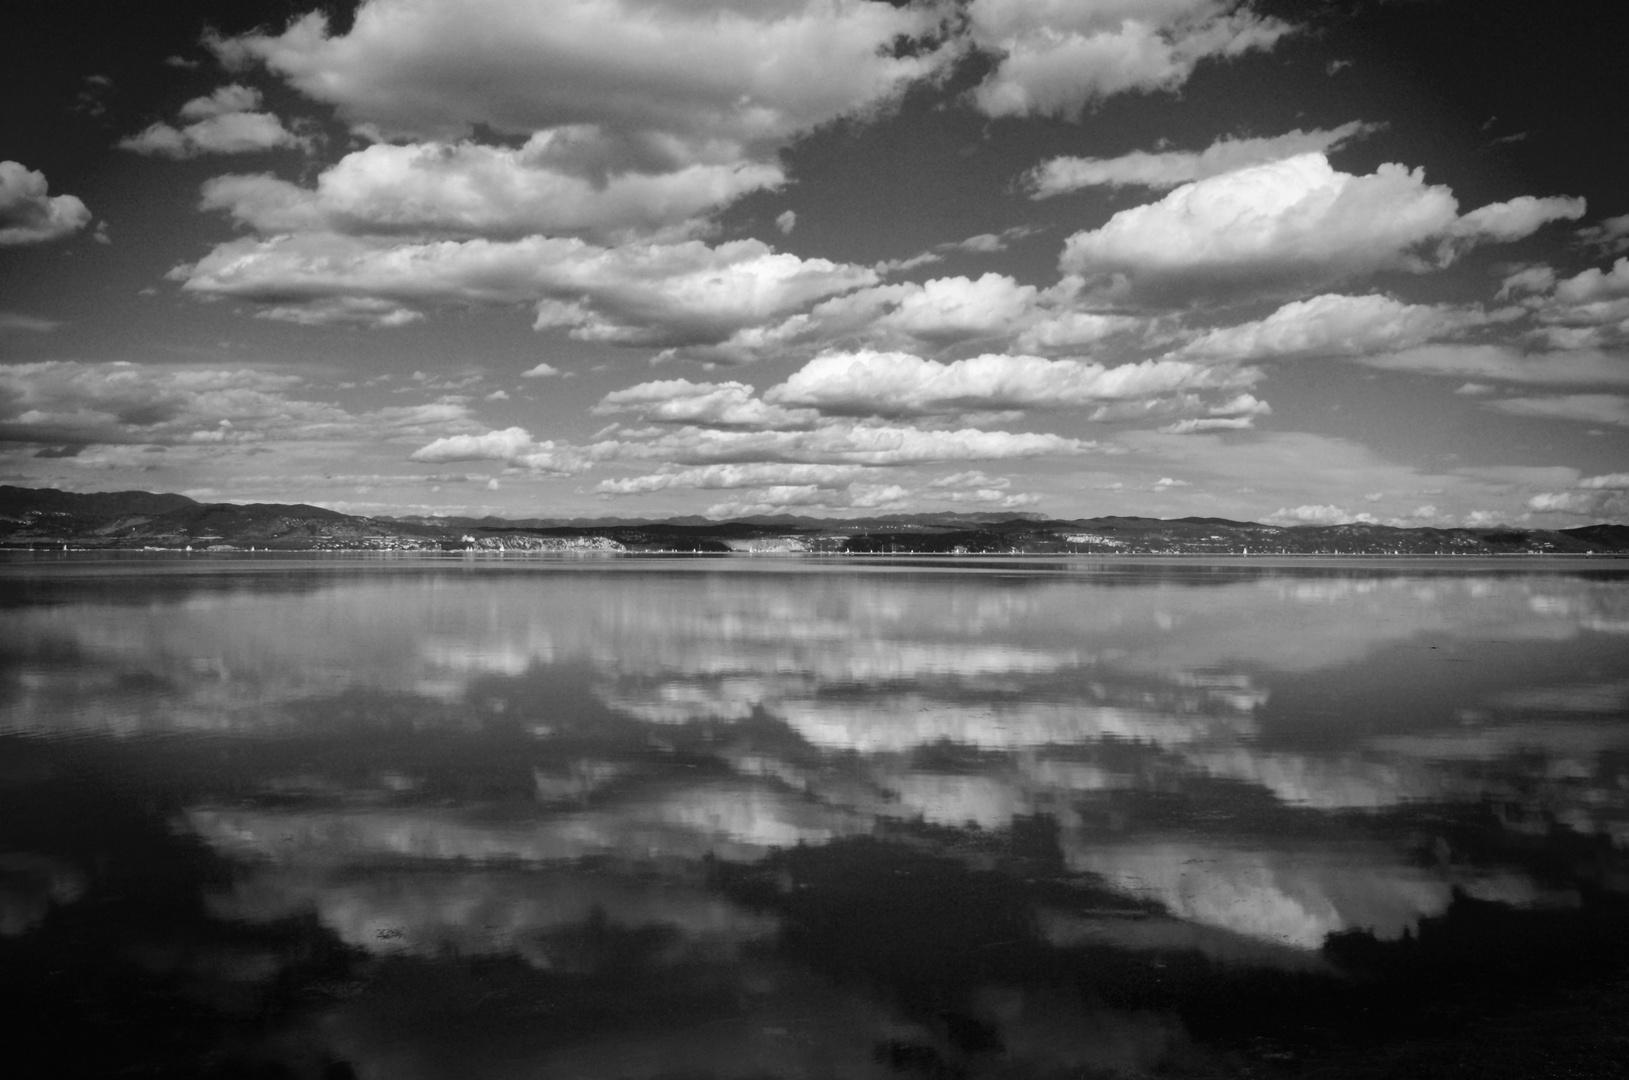 Reflected skies - Black & White version